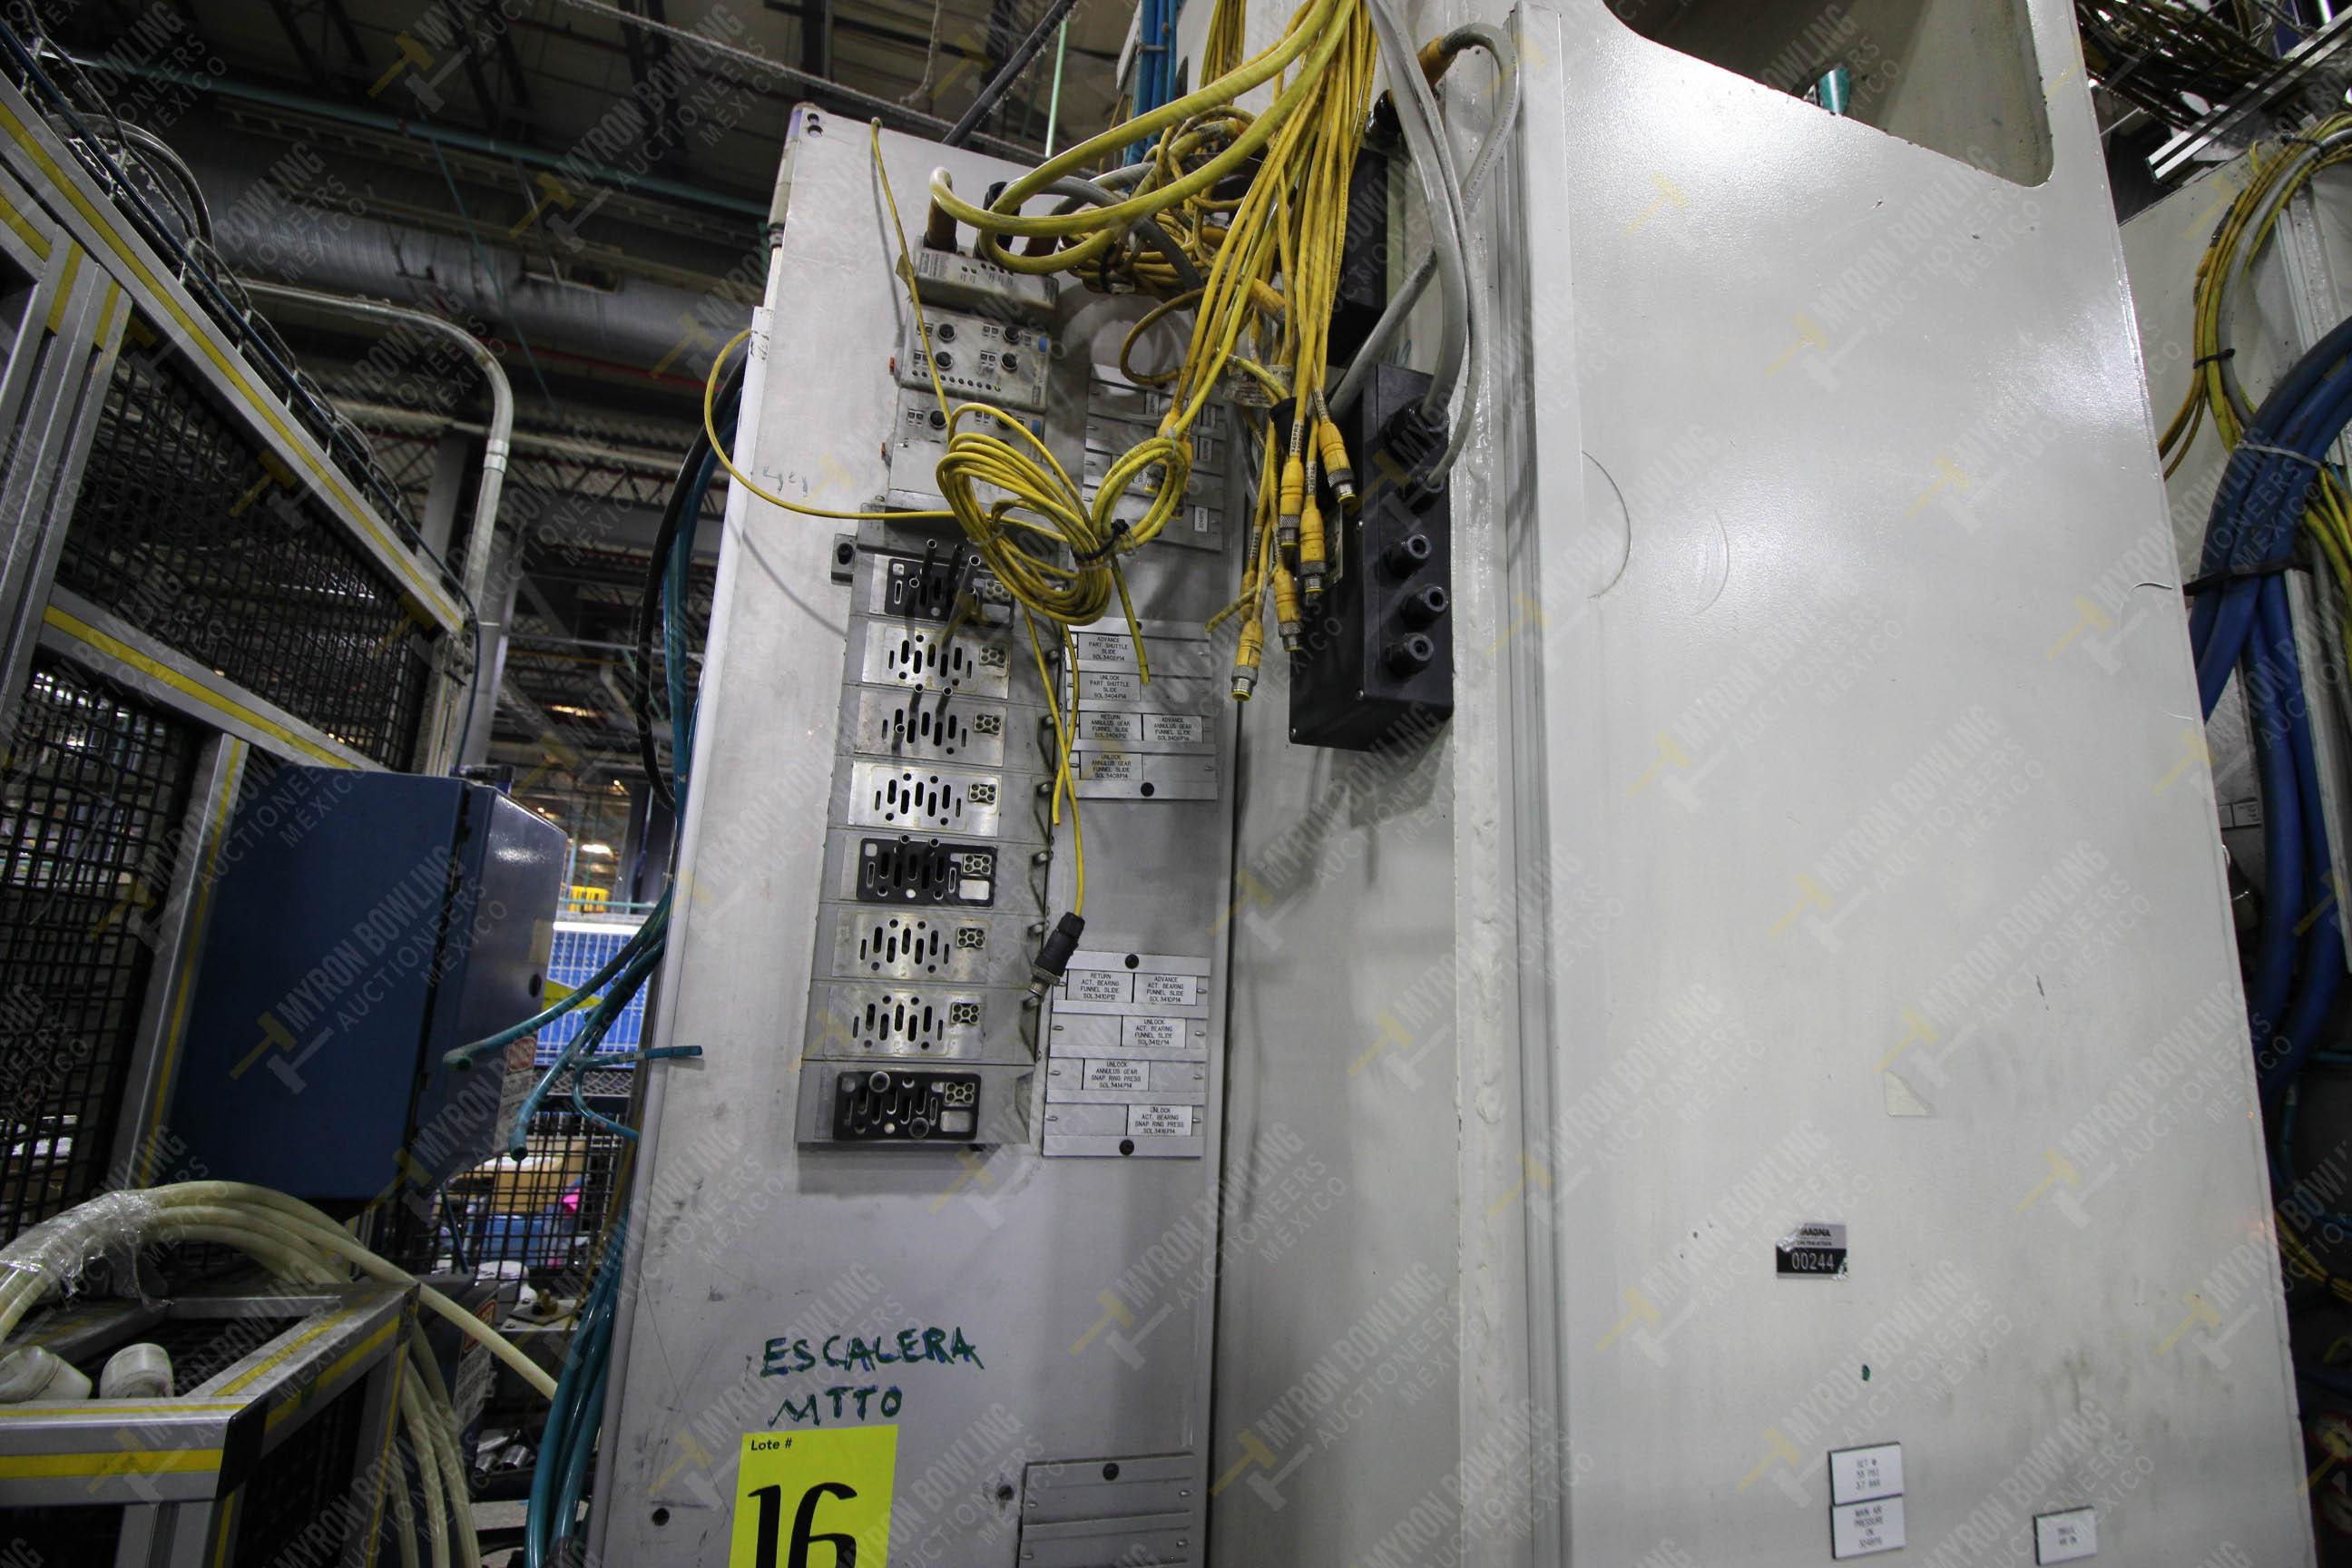 Estación semiautomática para operación 305D, contiene: Prensa tipo cuello de ganso con dos cilindros - Image 11 of 20